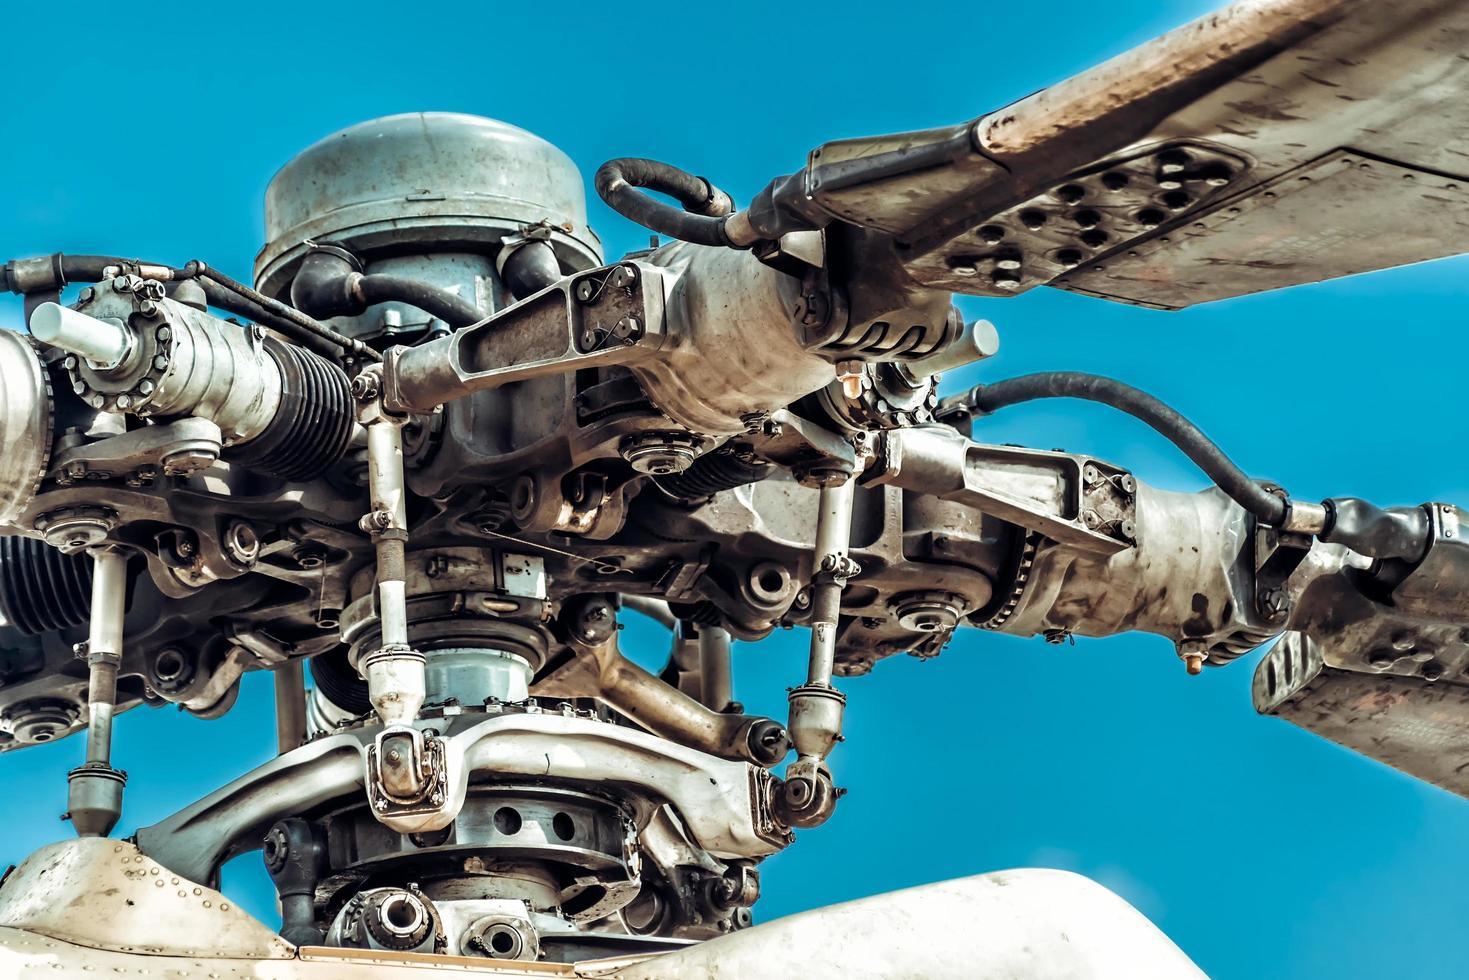 rotorbladen en rotorkop van militaire helikopter foto